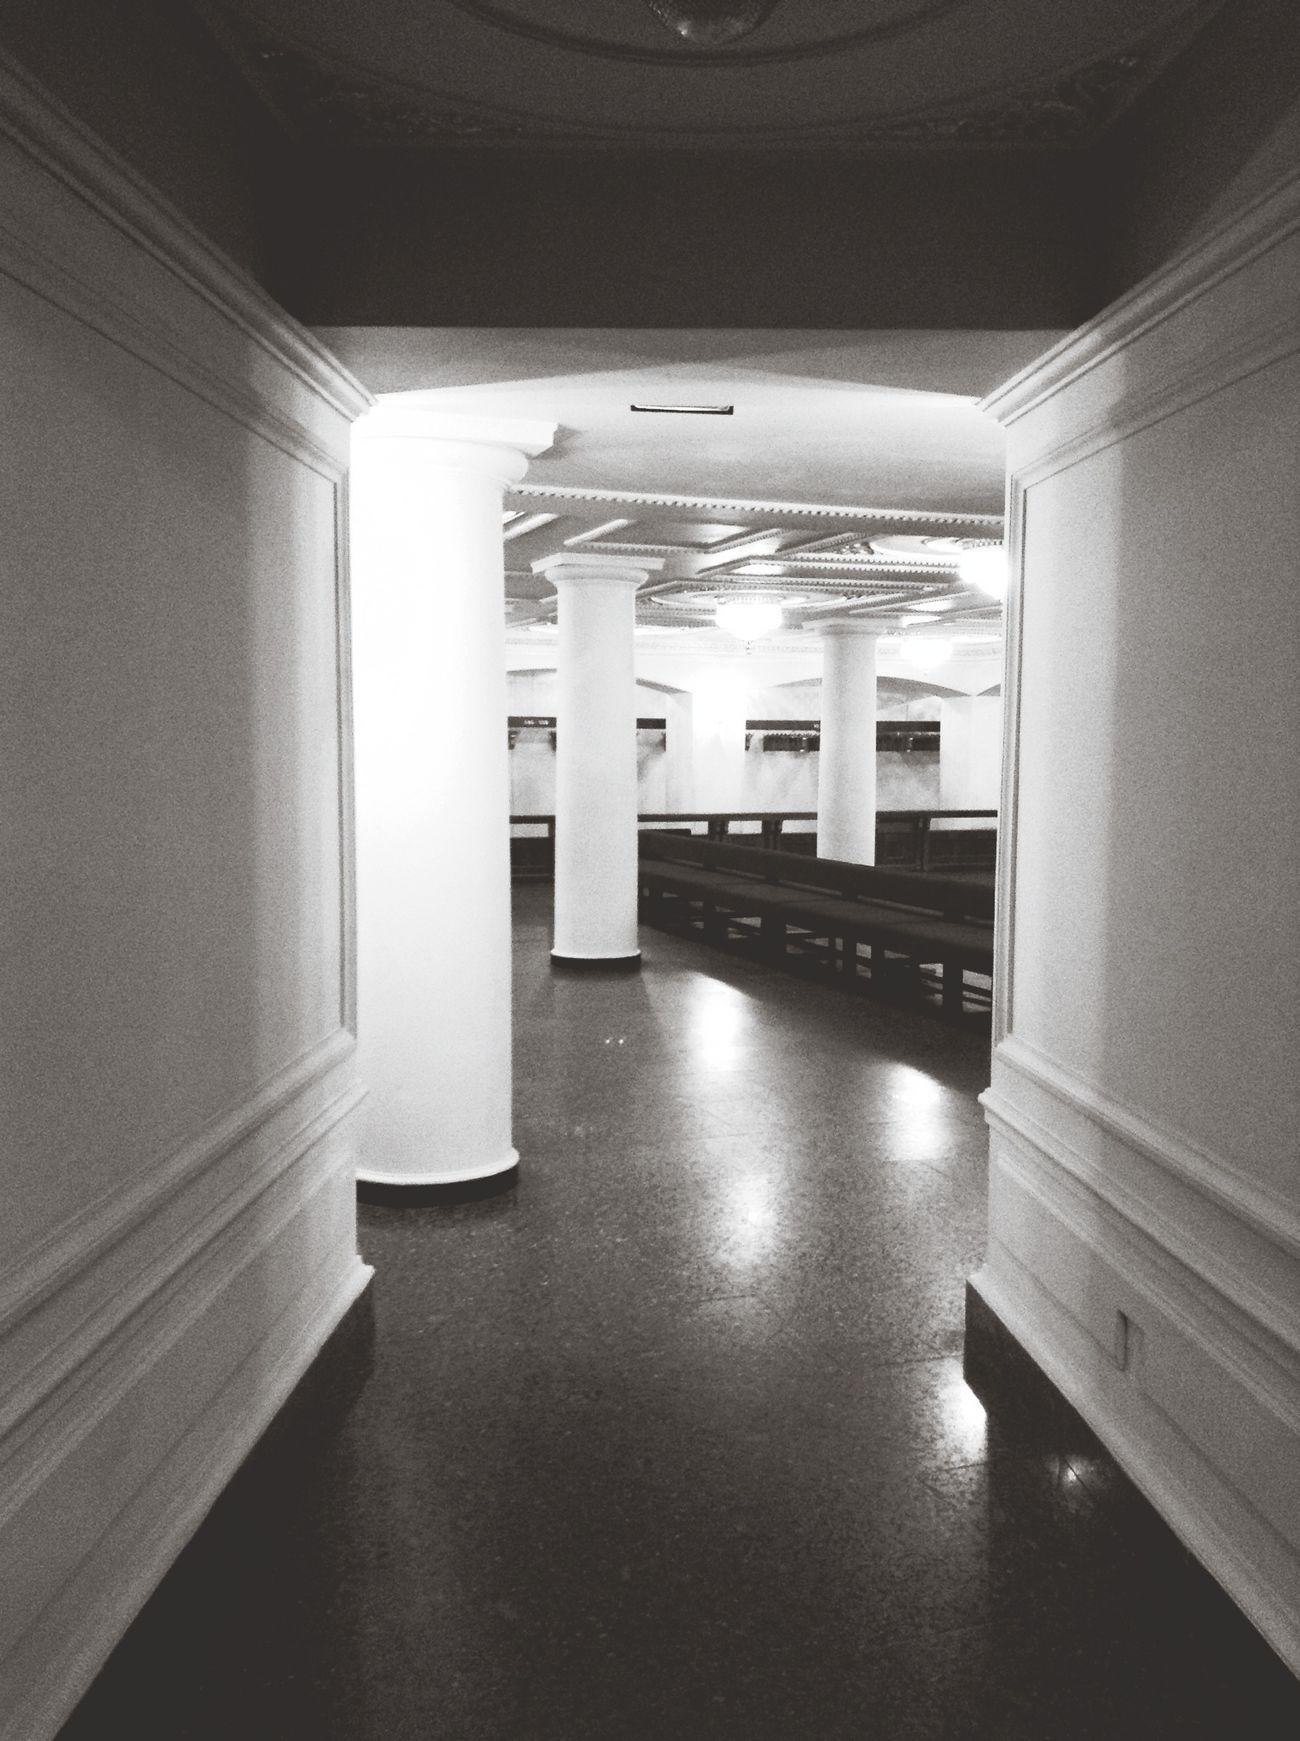 Simplicity Monochrome Building Black And White